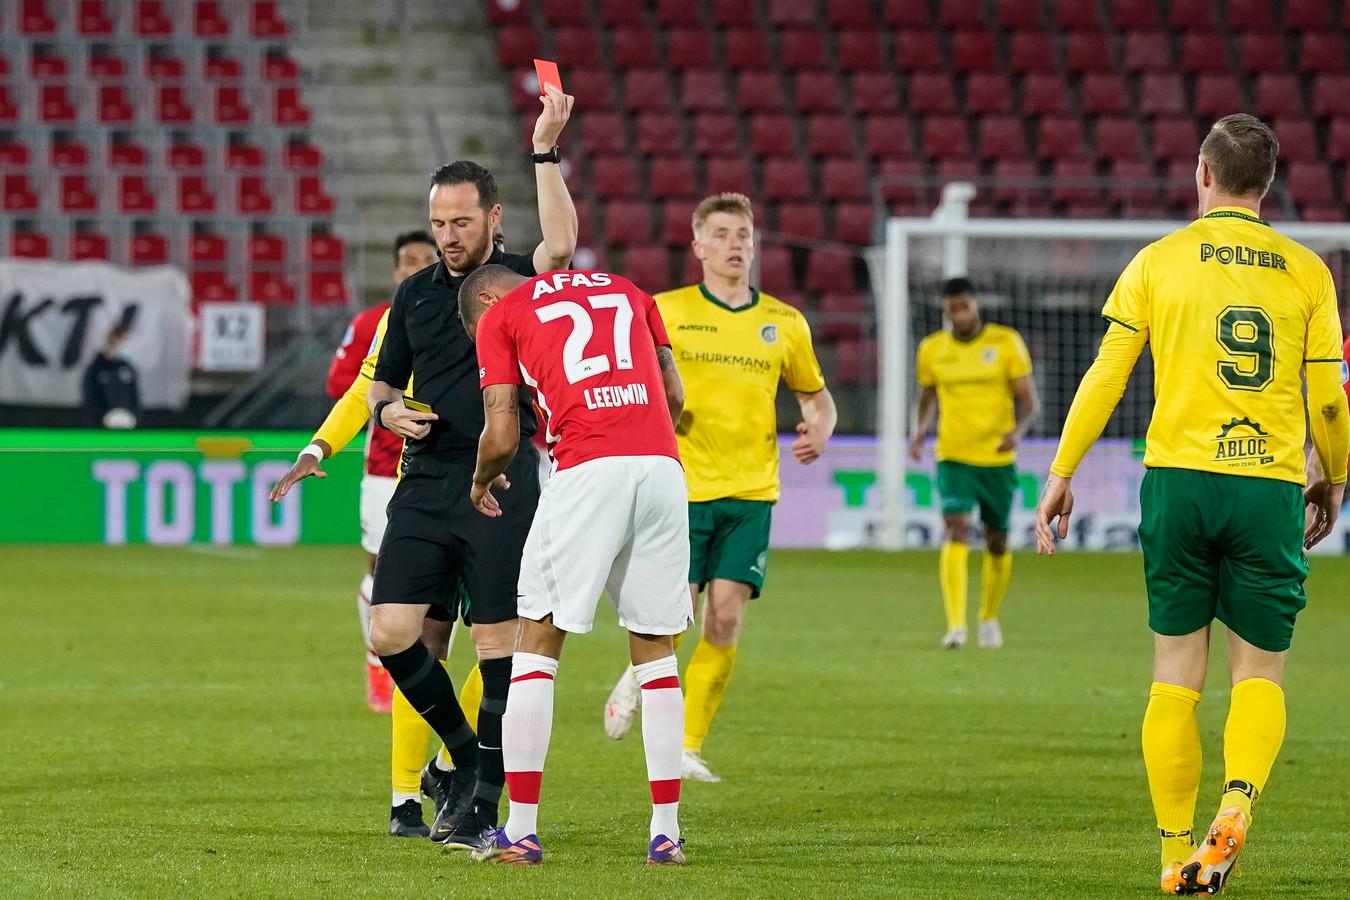 AZ-speler Ramon Leeuwin krijgt rood tegen Fortuna Sittard.